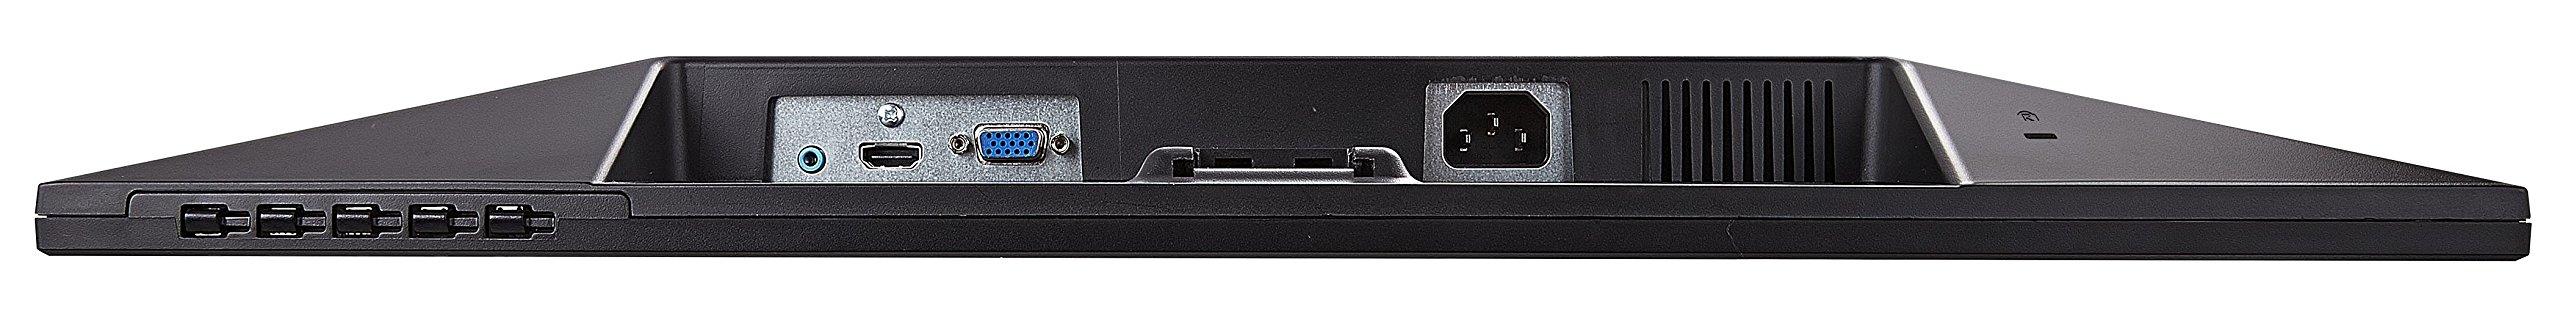 Viewsonic VA2407H 60 cm (24 Zoll) Monitor (Full-HD, 3 ms, HDMI) Schwarz